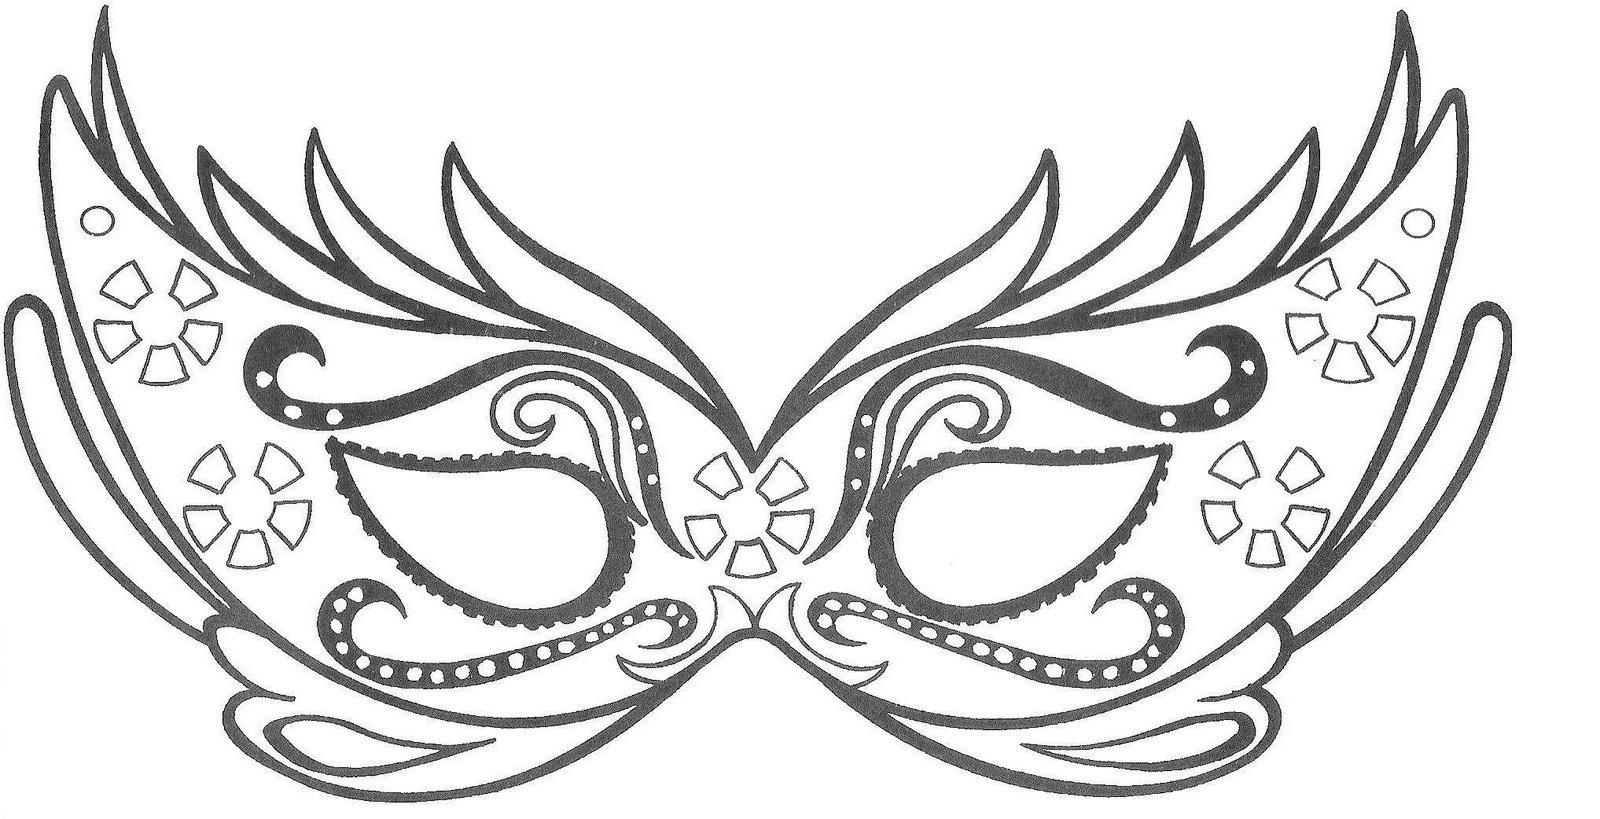 Desenhos Para Colorir Do Carnaval – Imagens E Máscaras